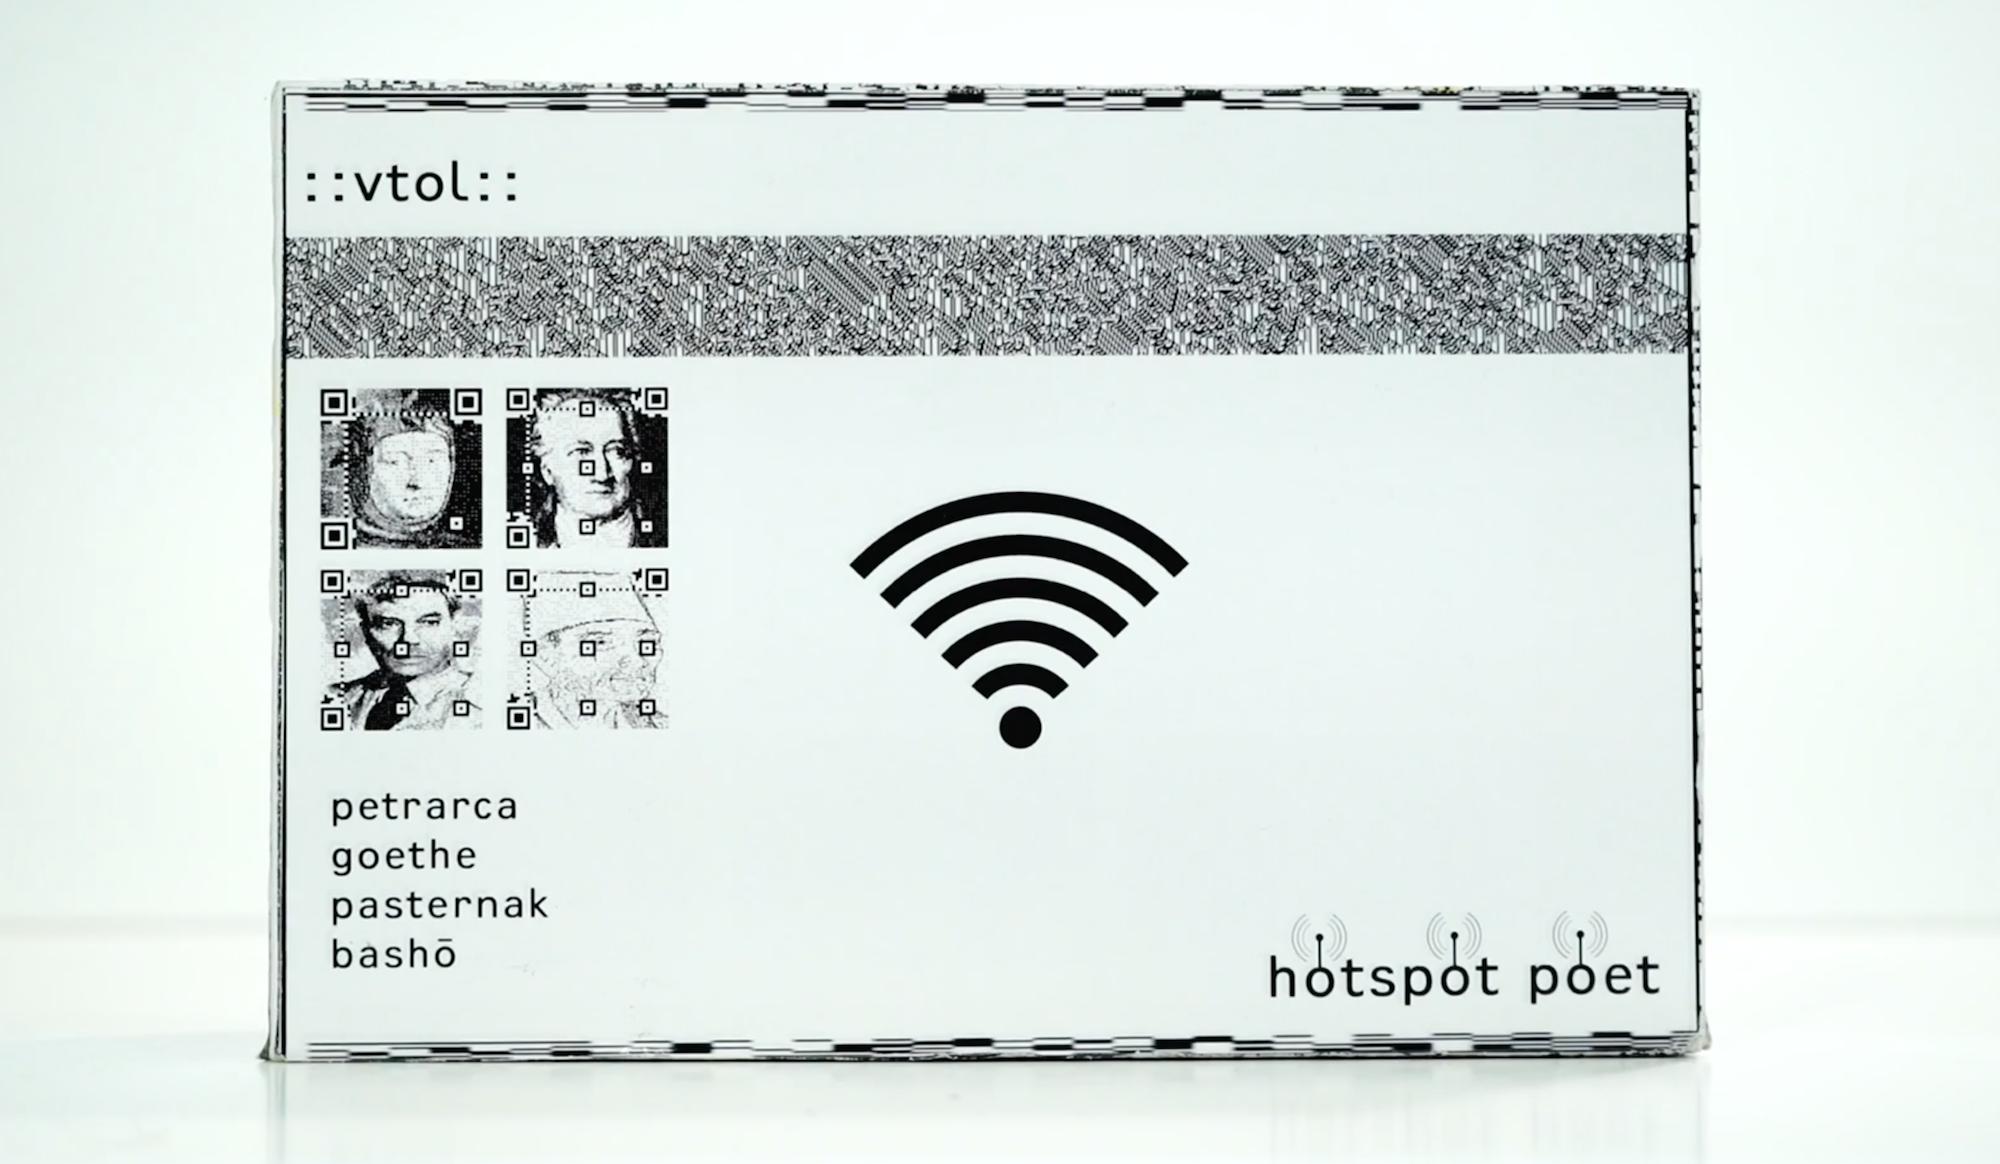 Hotspot Poets, la poesia diventa wifi